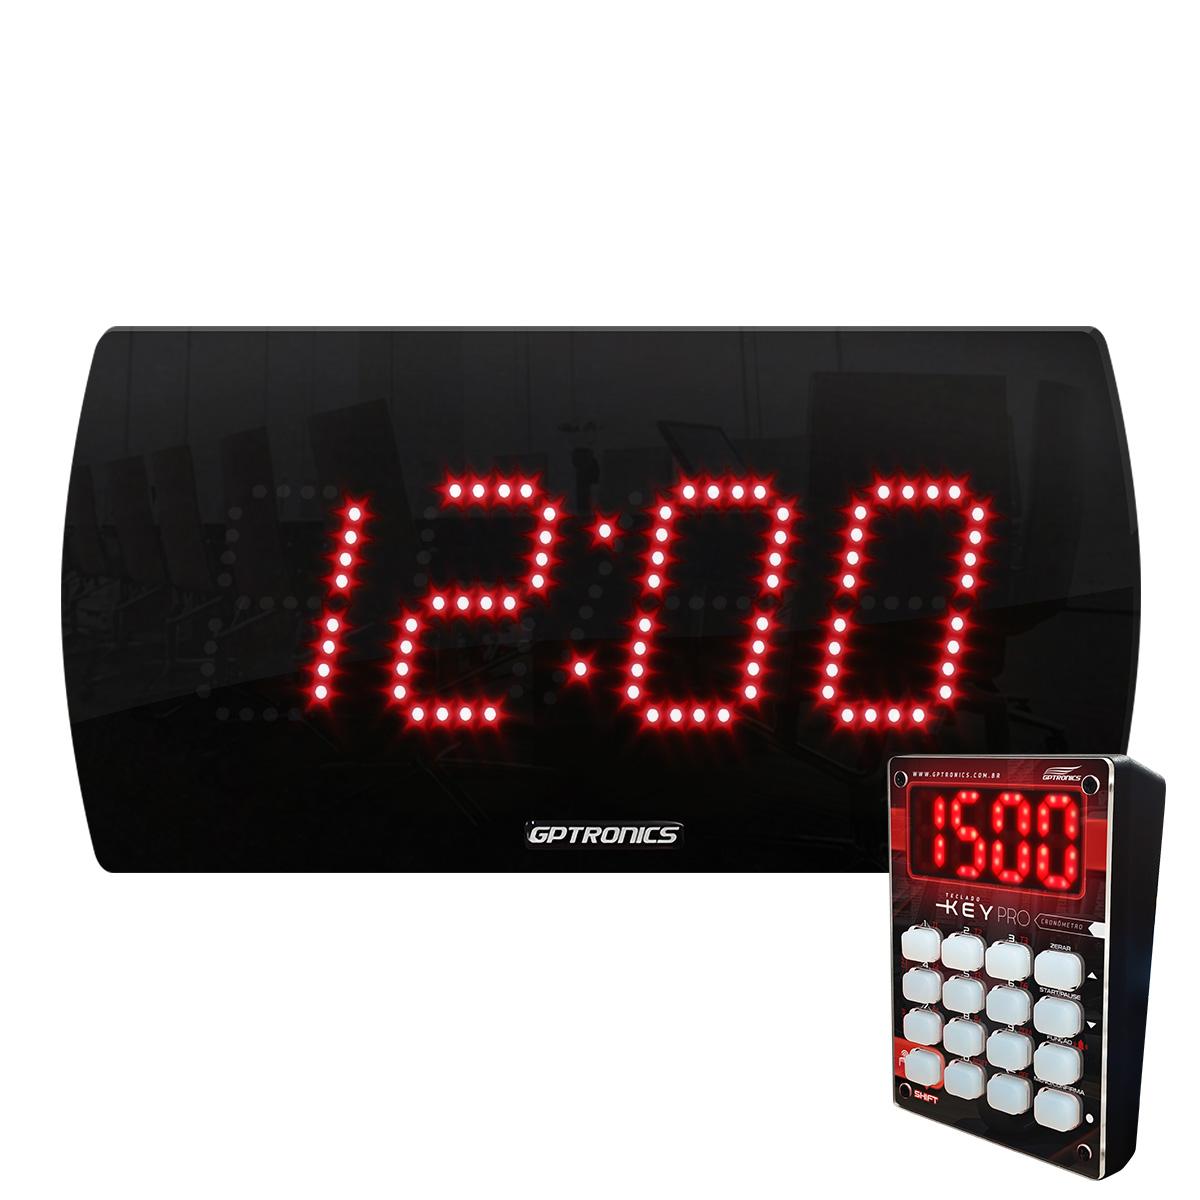 Painel Relógio Cronômetro LEDTime 25 N - com teclado Key Pro - 28x14CM